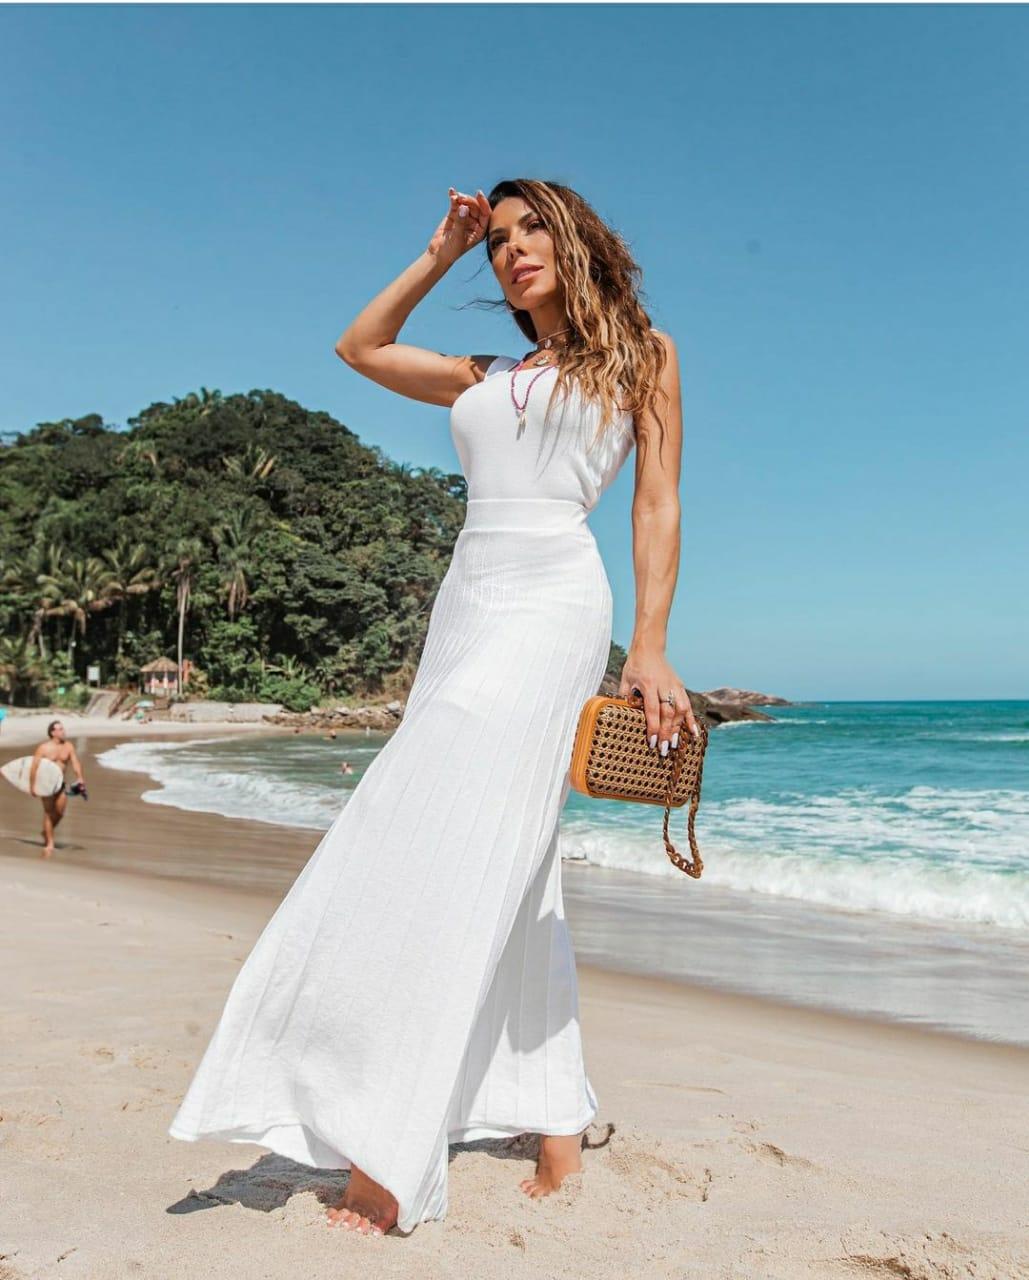 Conjunto Modal Resort Branco off white saia longa e blusa decote quadrado.